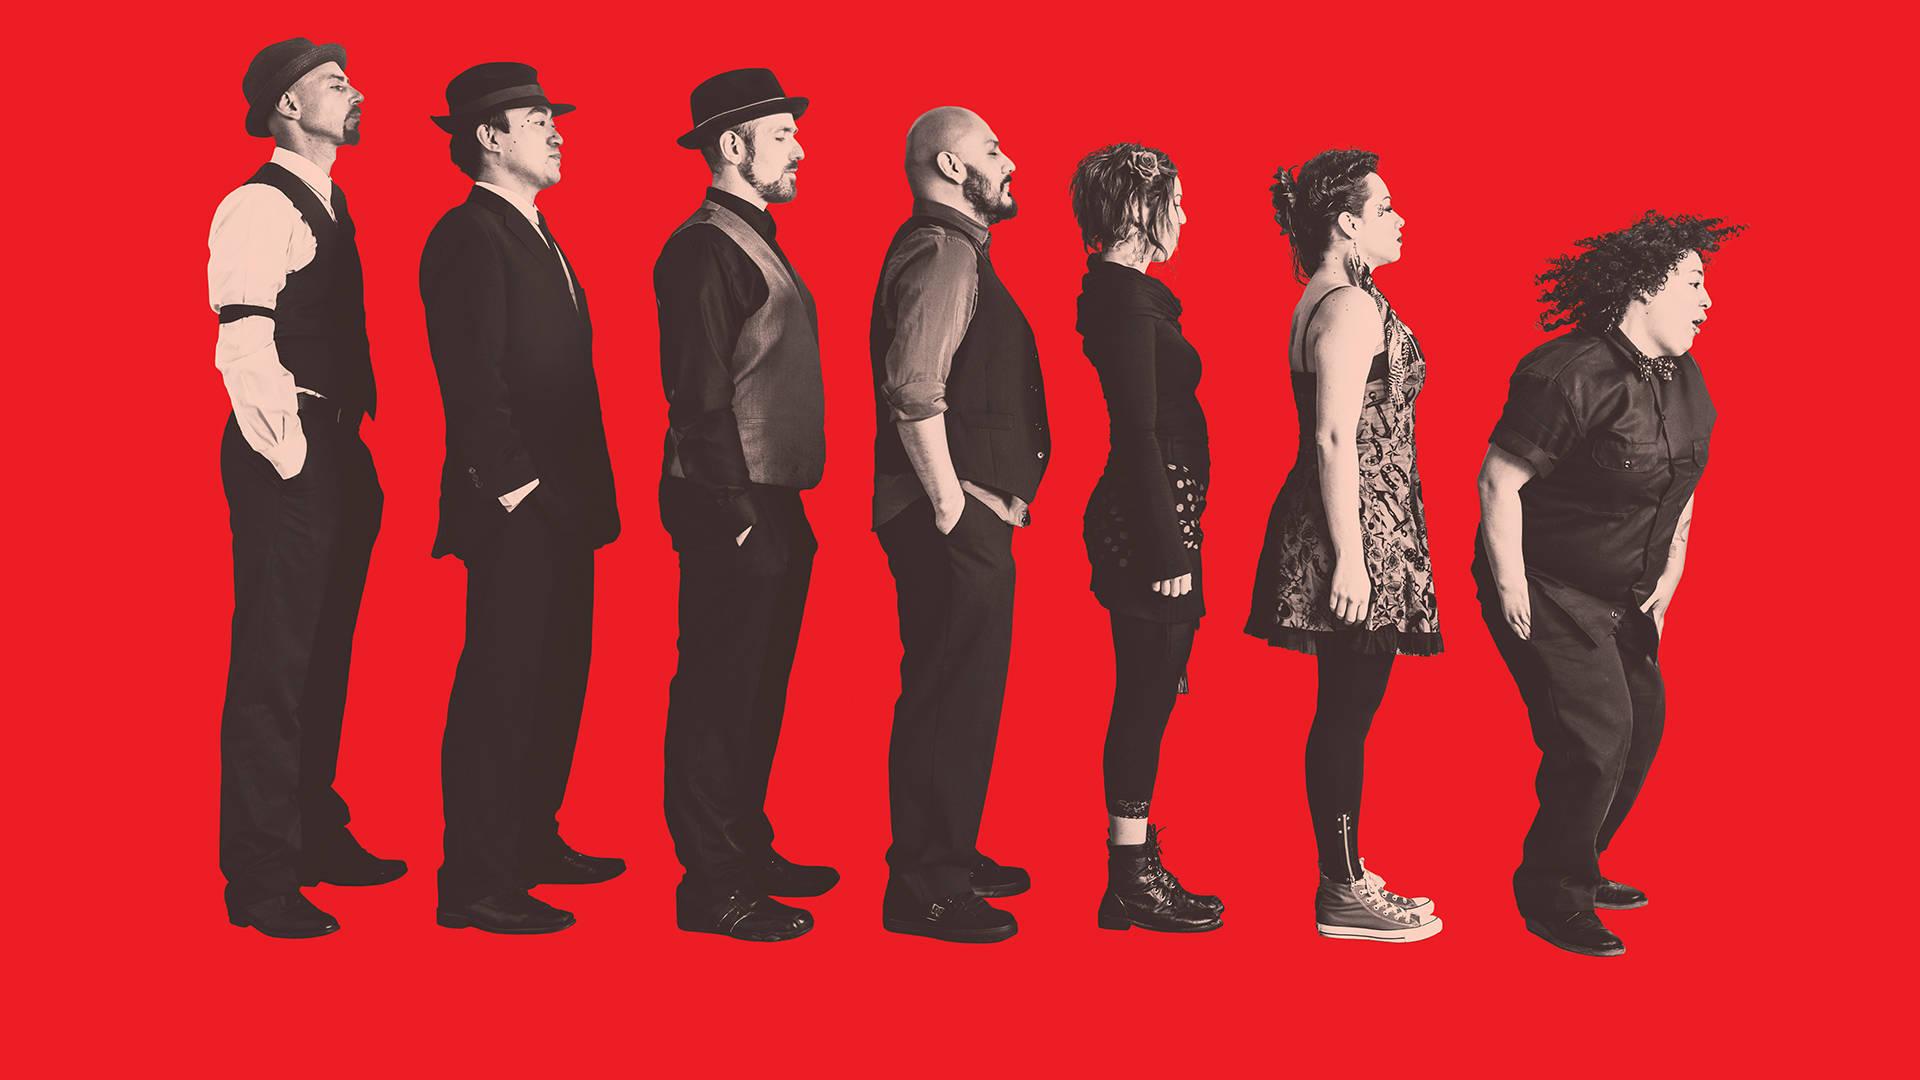 La Misa Negra's self-titled second studio album captures the frenetic energy of the band's popular live shows. La Misa Negra